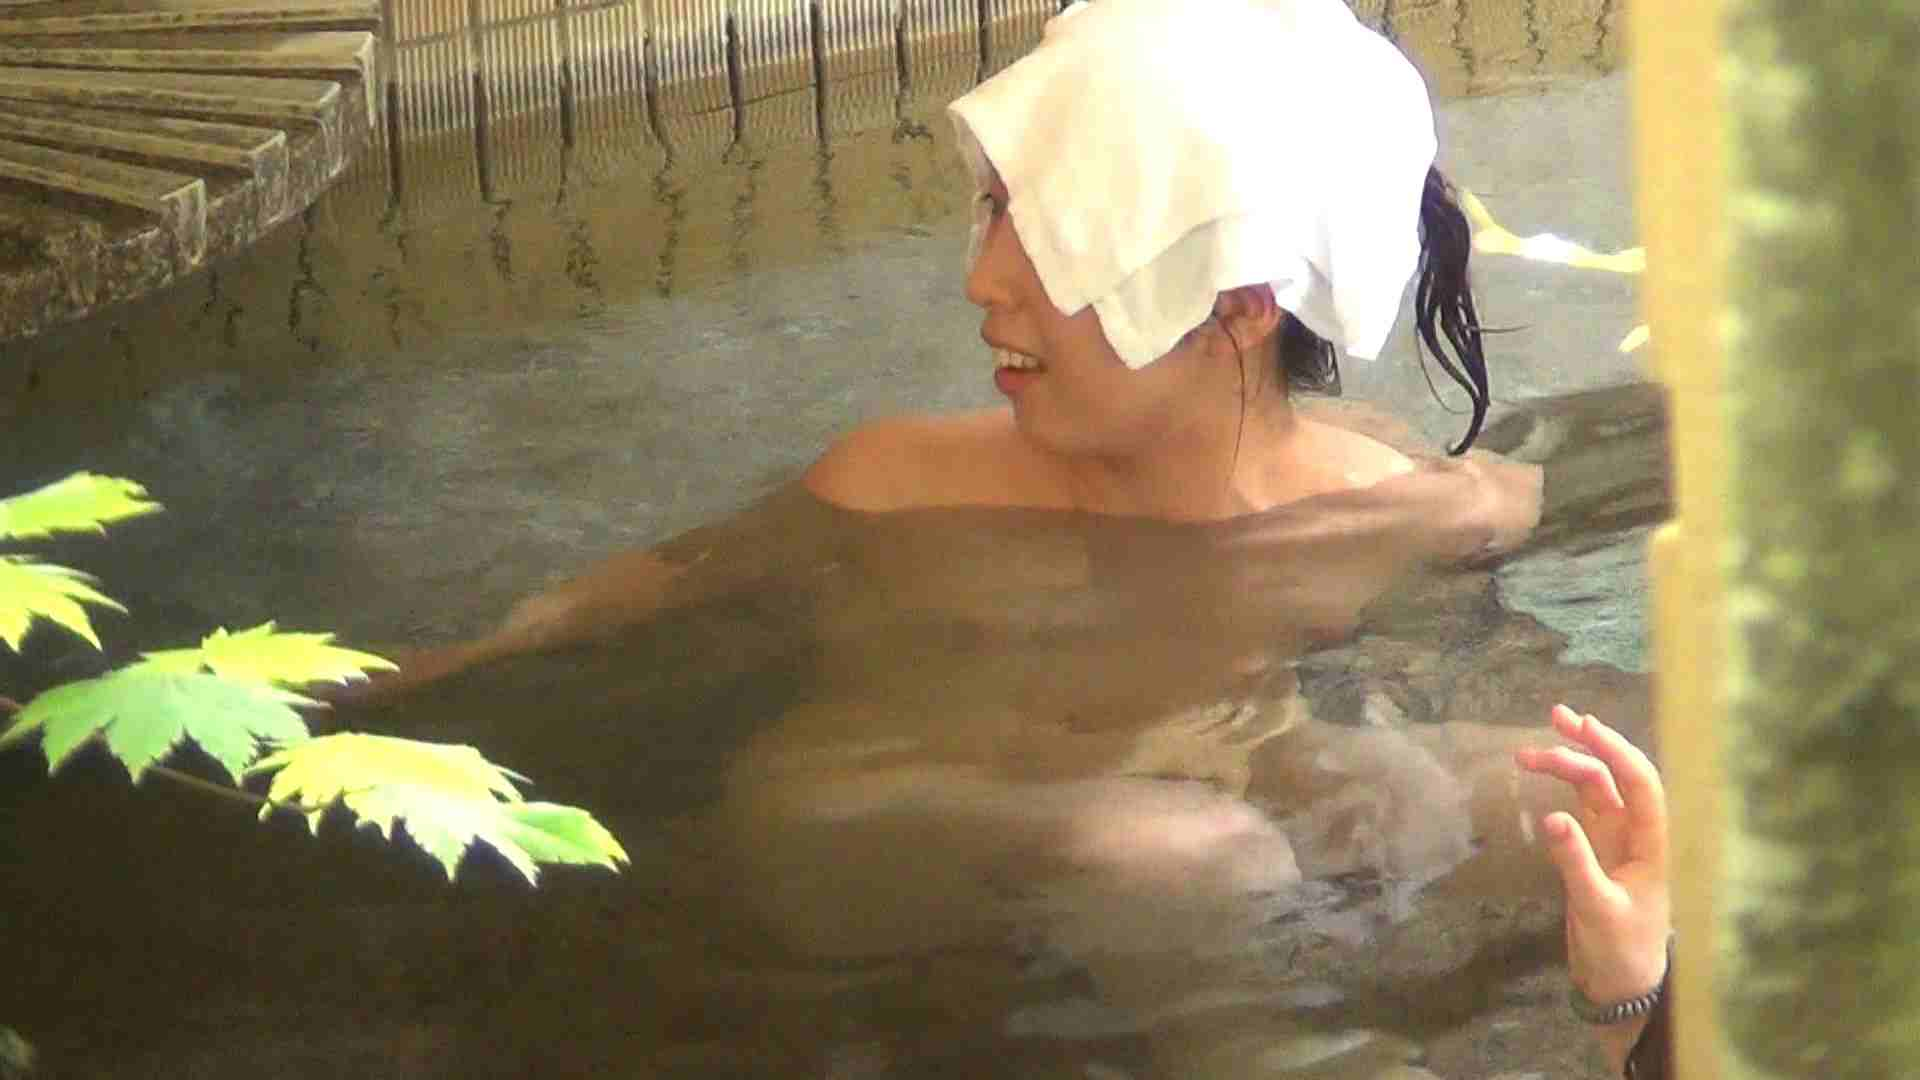 Aquaな露天風呂Vol.247 OLのエロ生活 おめこ無修正画像 83連発 65